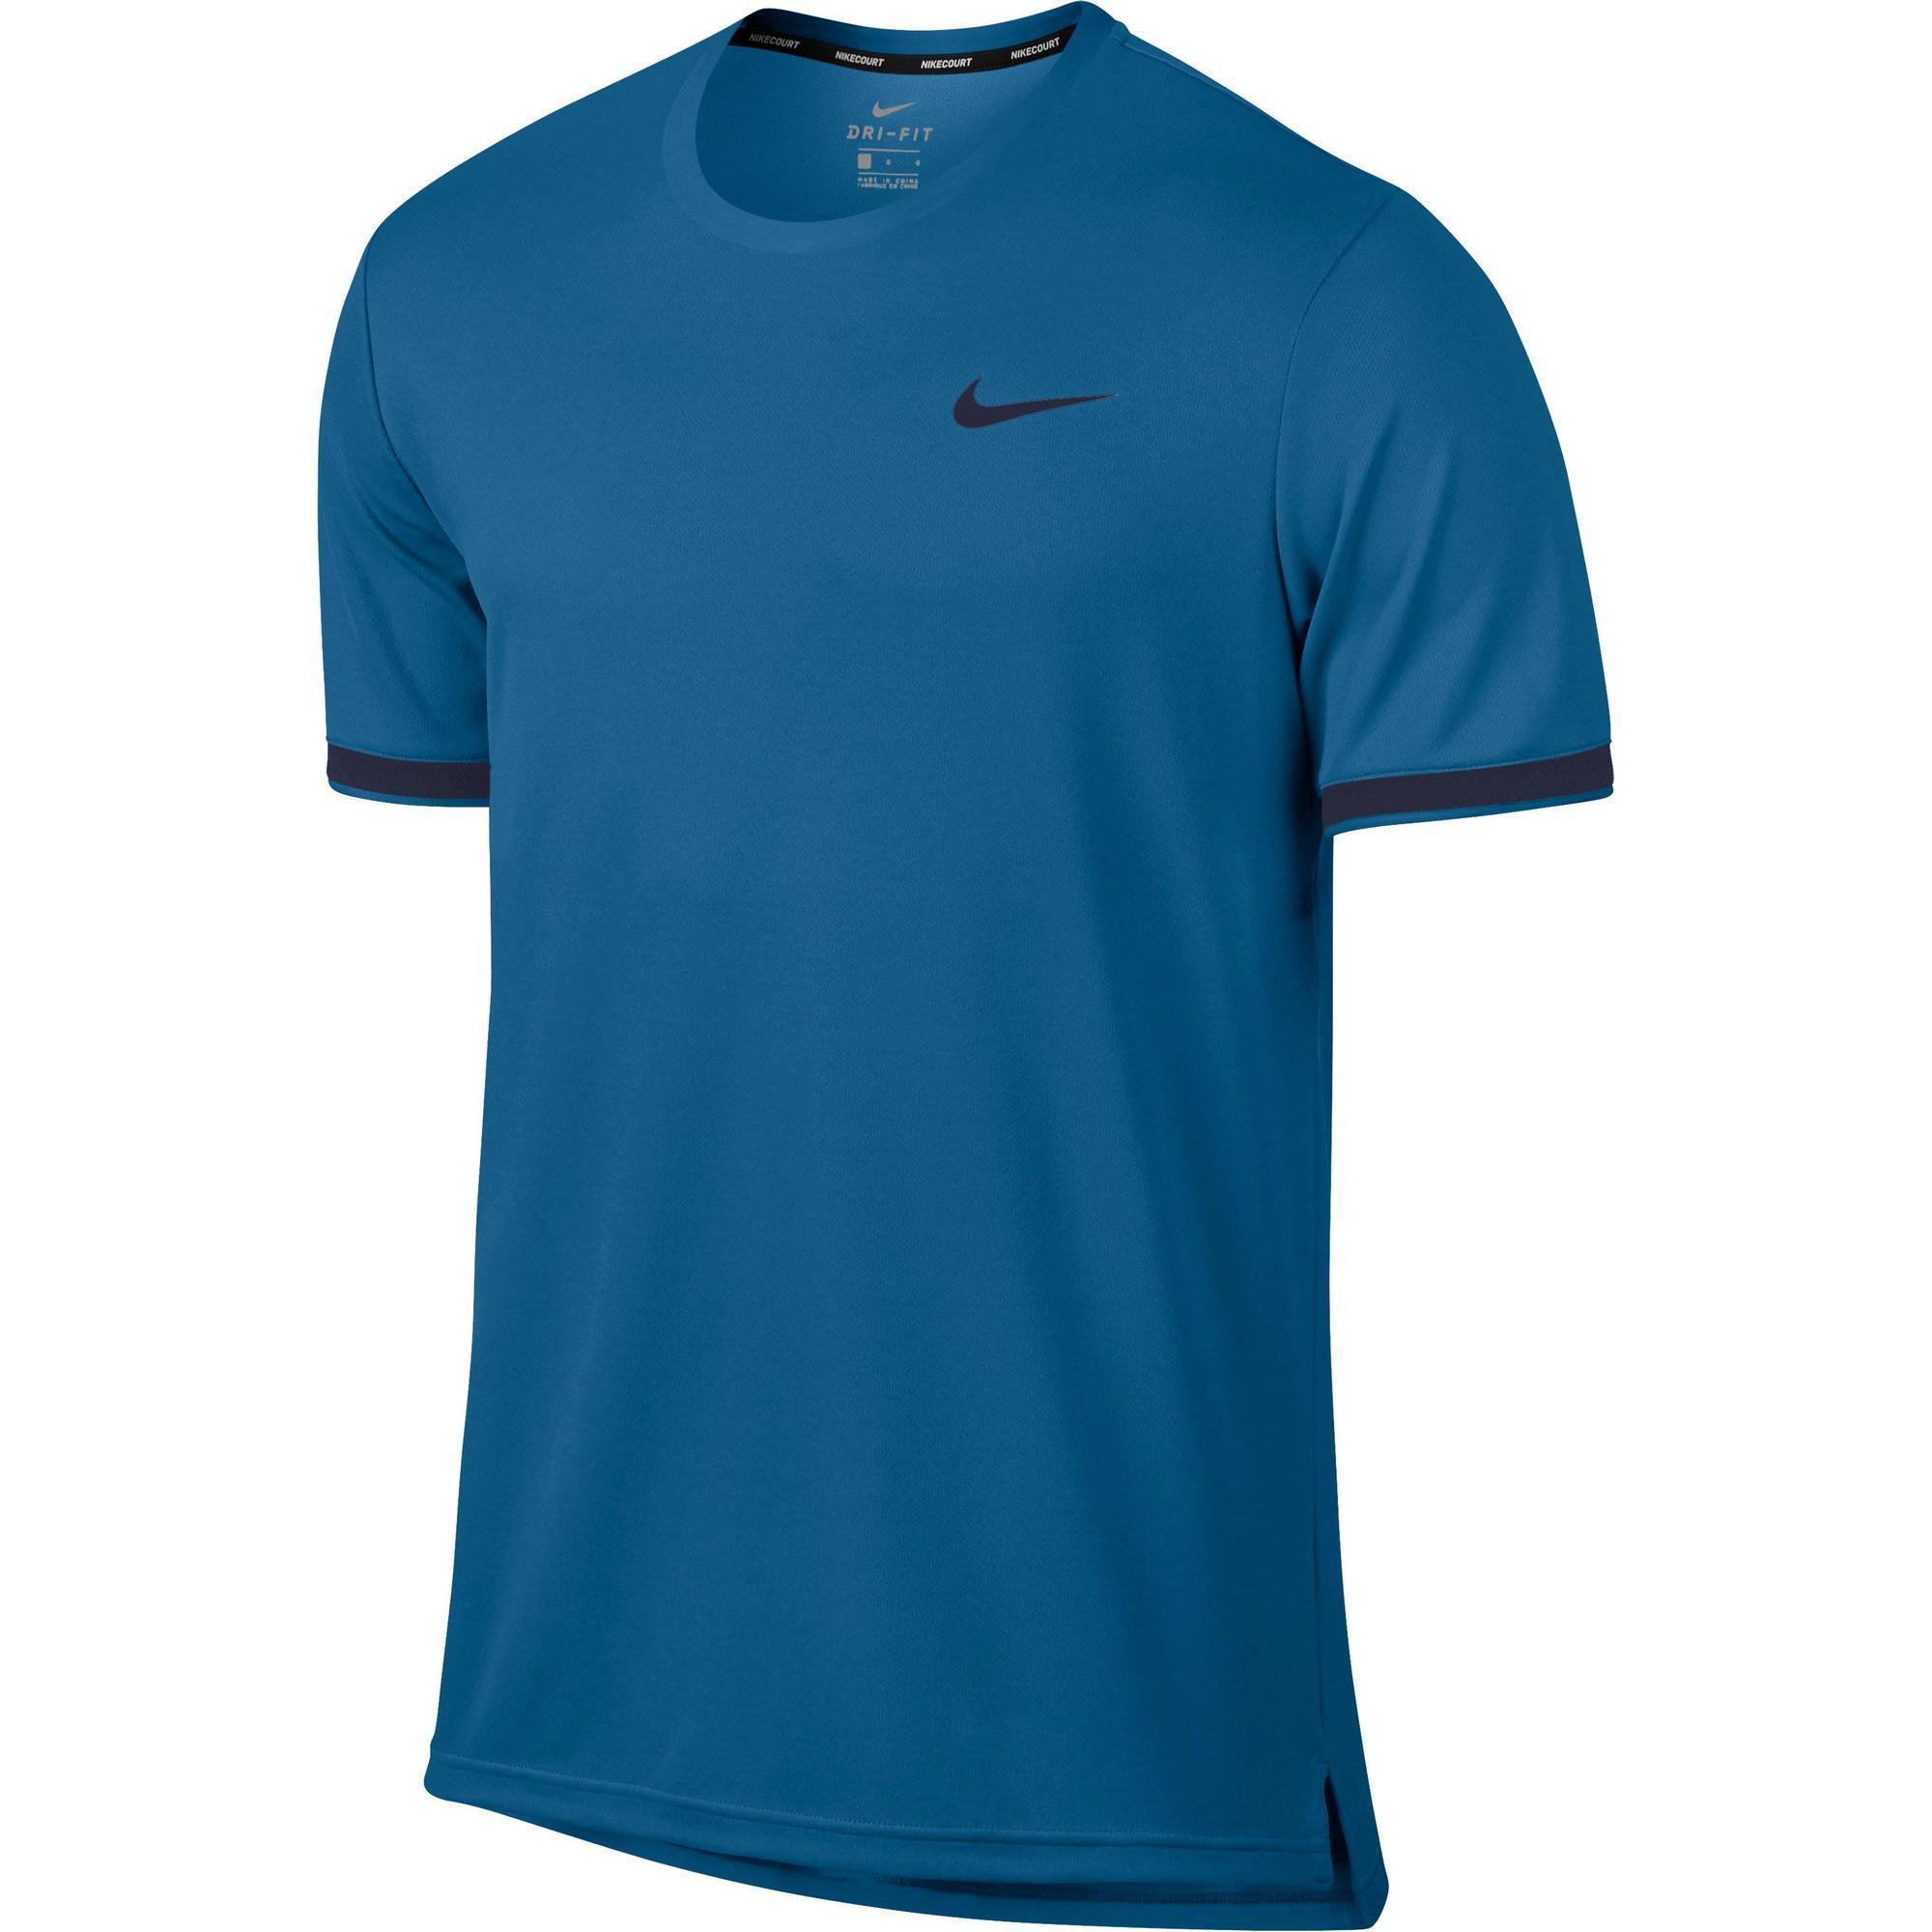 Nike Tennis T-shirt Nike Dry Top Team blauw